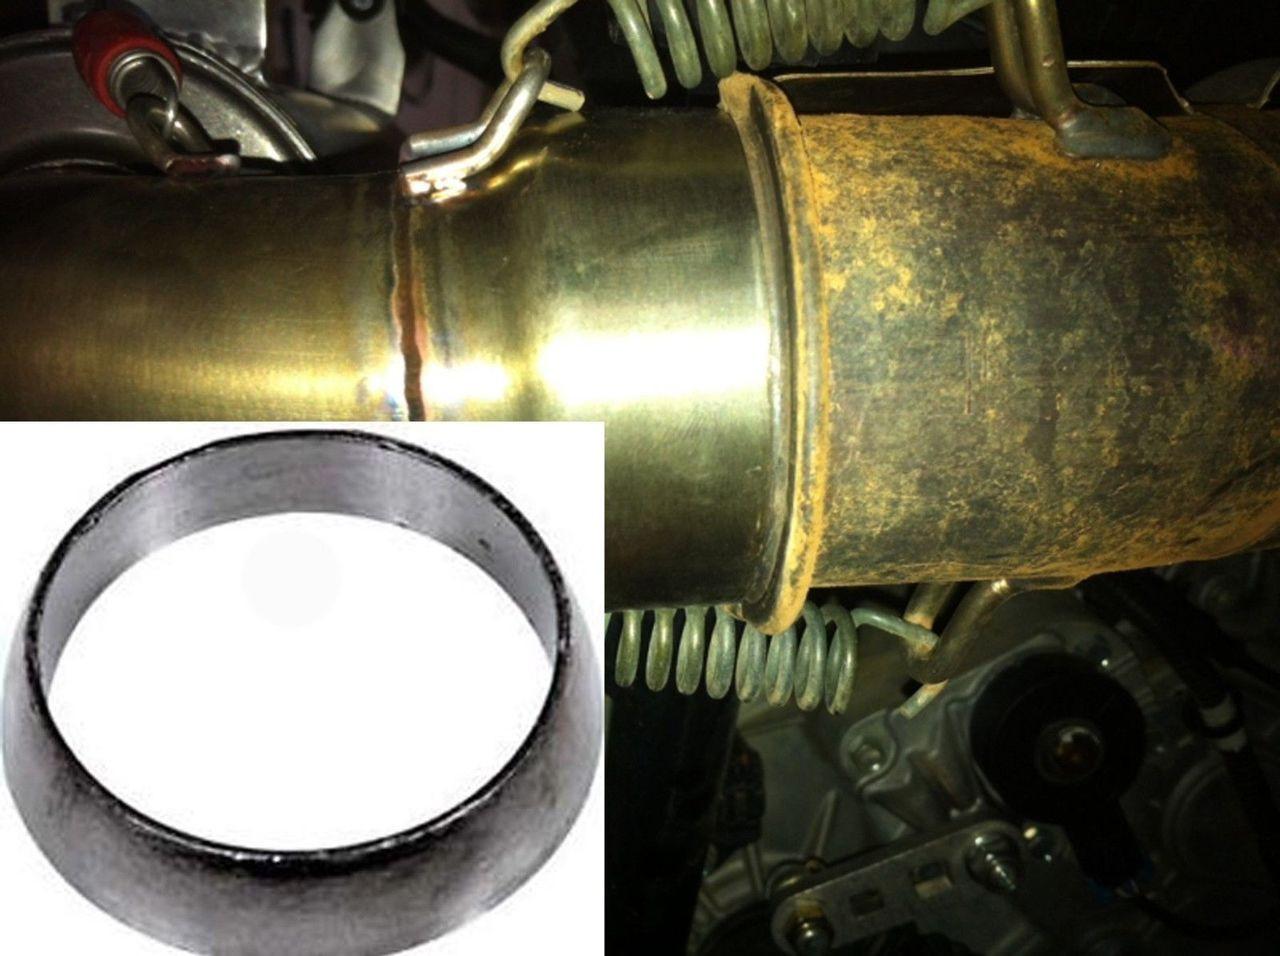 polaris rzr 800 rzr 800s rzr 4 exhaust donut manifold gasket 2008 2014